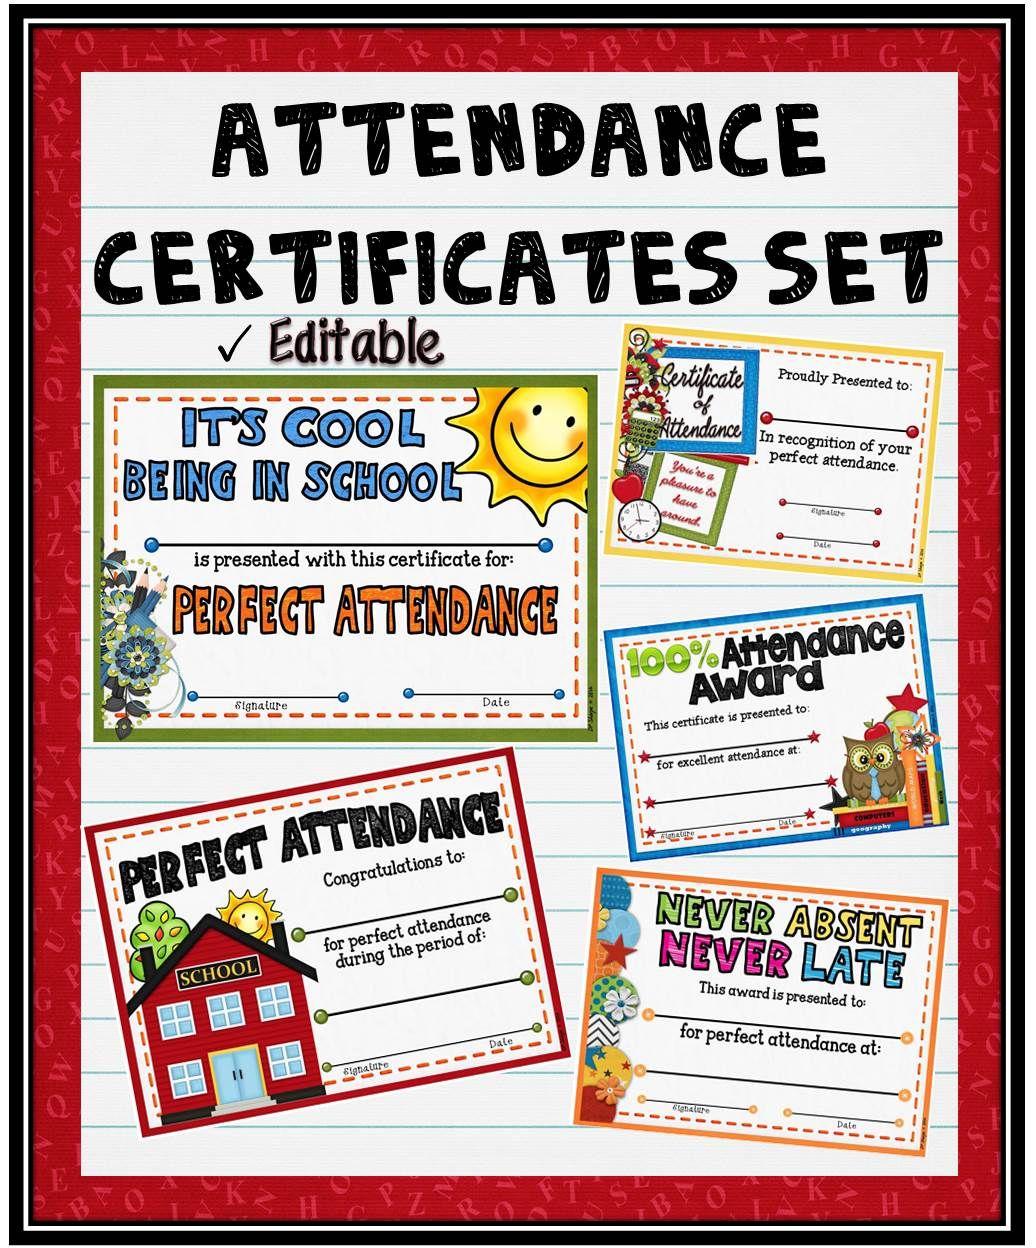 Attendance Certificates Set Fillable The Bundle Board